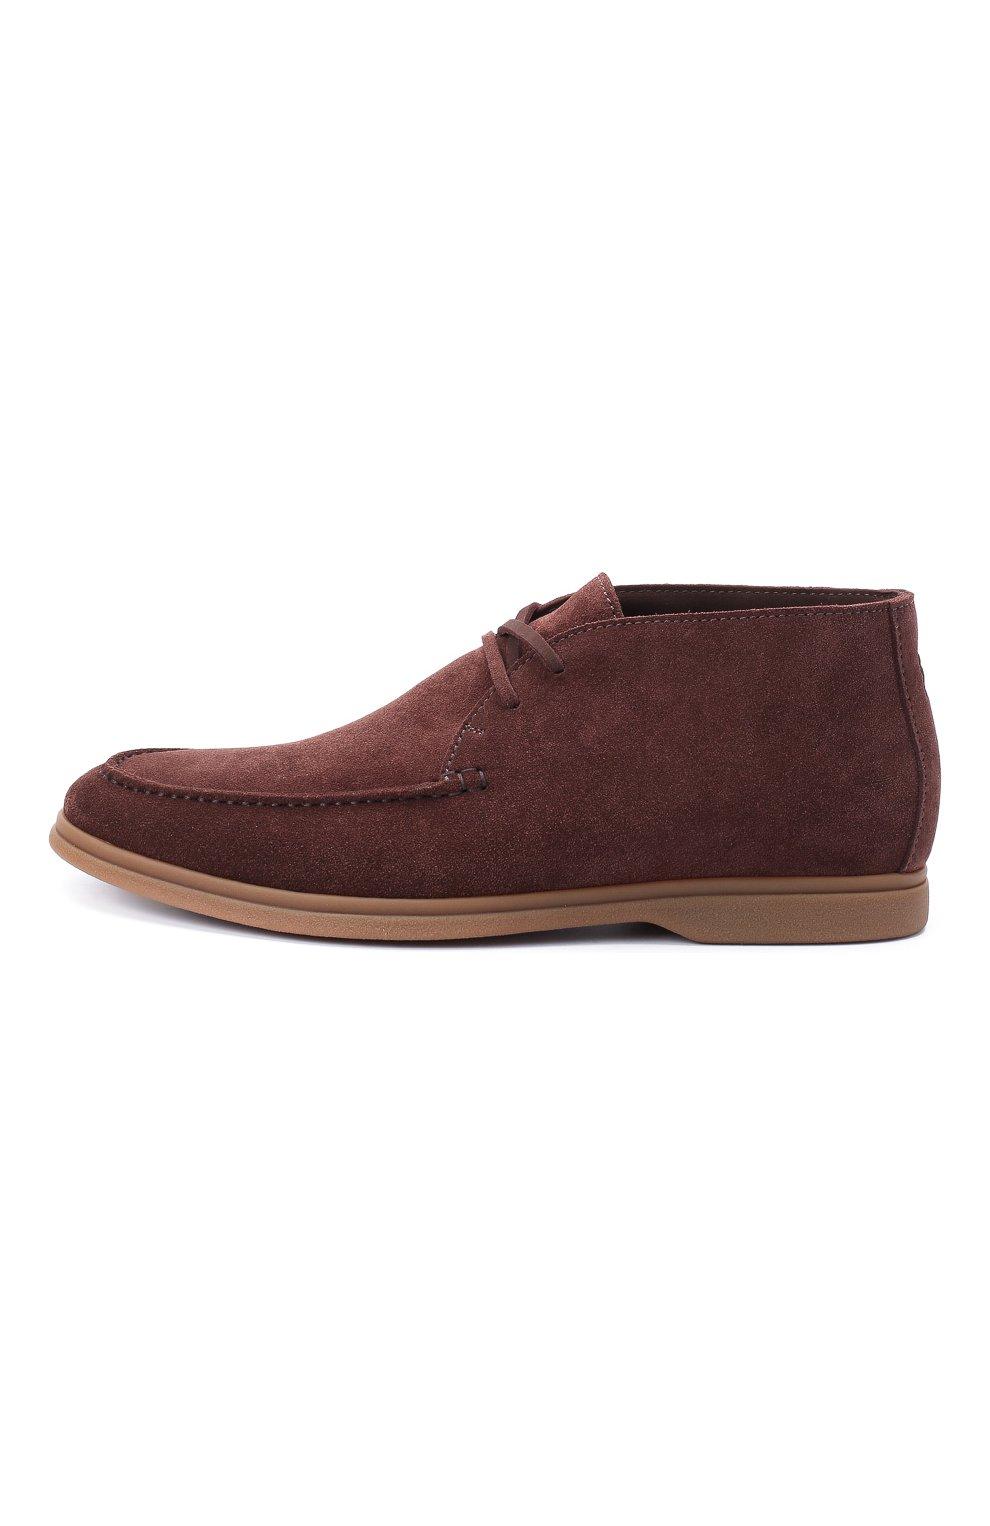 Мужские замшевые ботинки BRUNELLO CUCINELLI коричневого цвета, арт. MZUC0BB857 | Фото 3